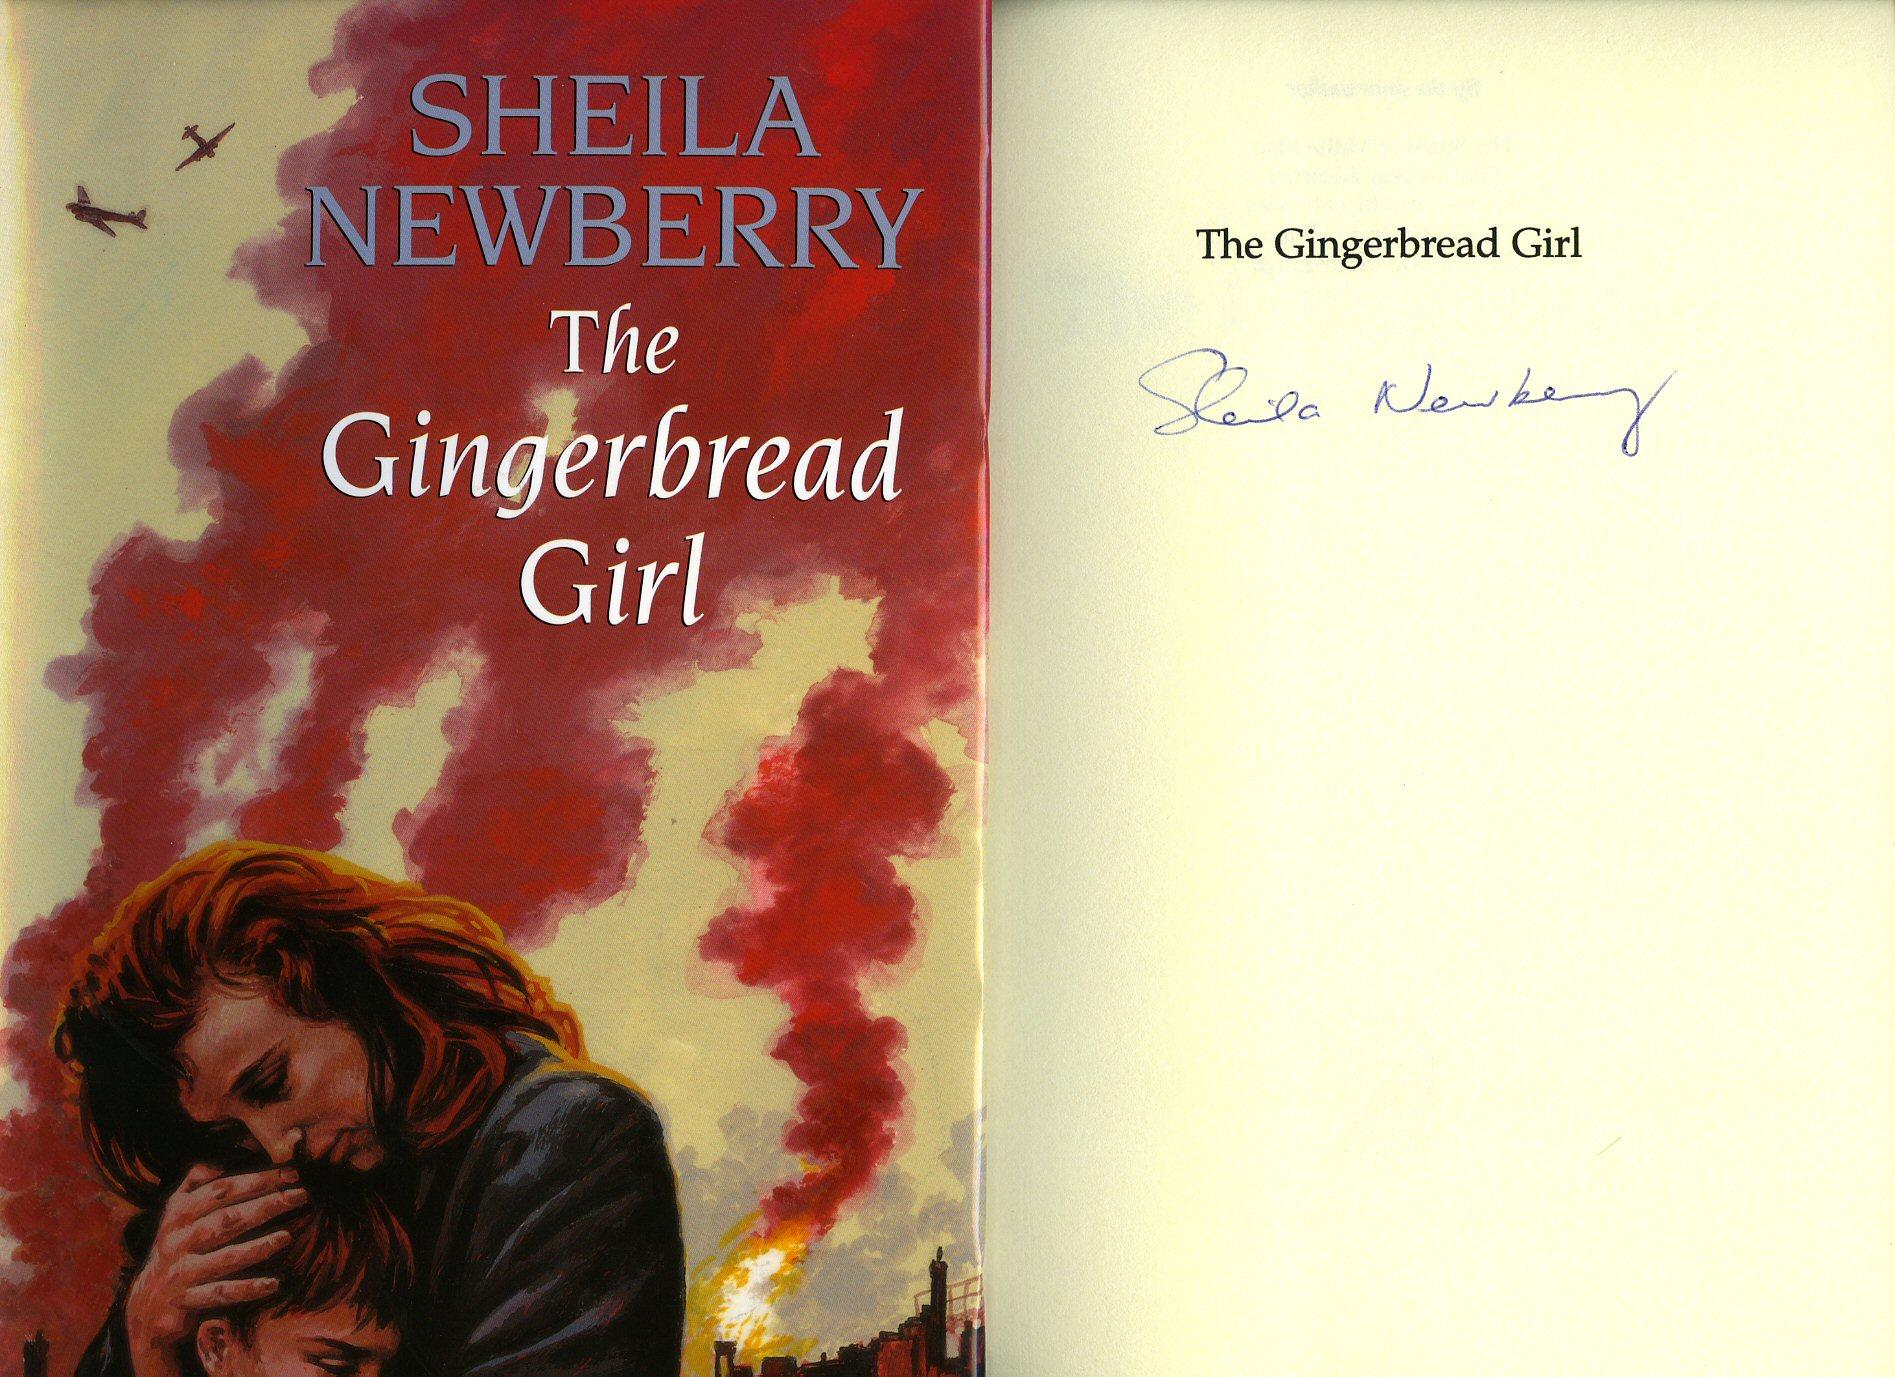 NEWBERRY, SHEILA [JACKET ILLUSTRATION BY BARBARA WALTON] - The Gingerbread Girl [Twice Signed + Sticker]